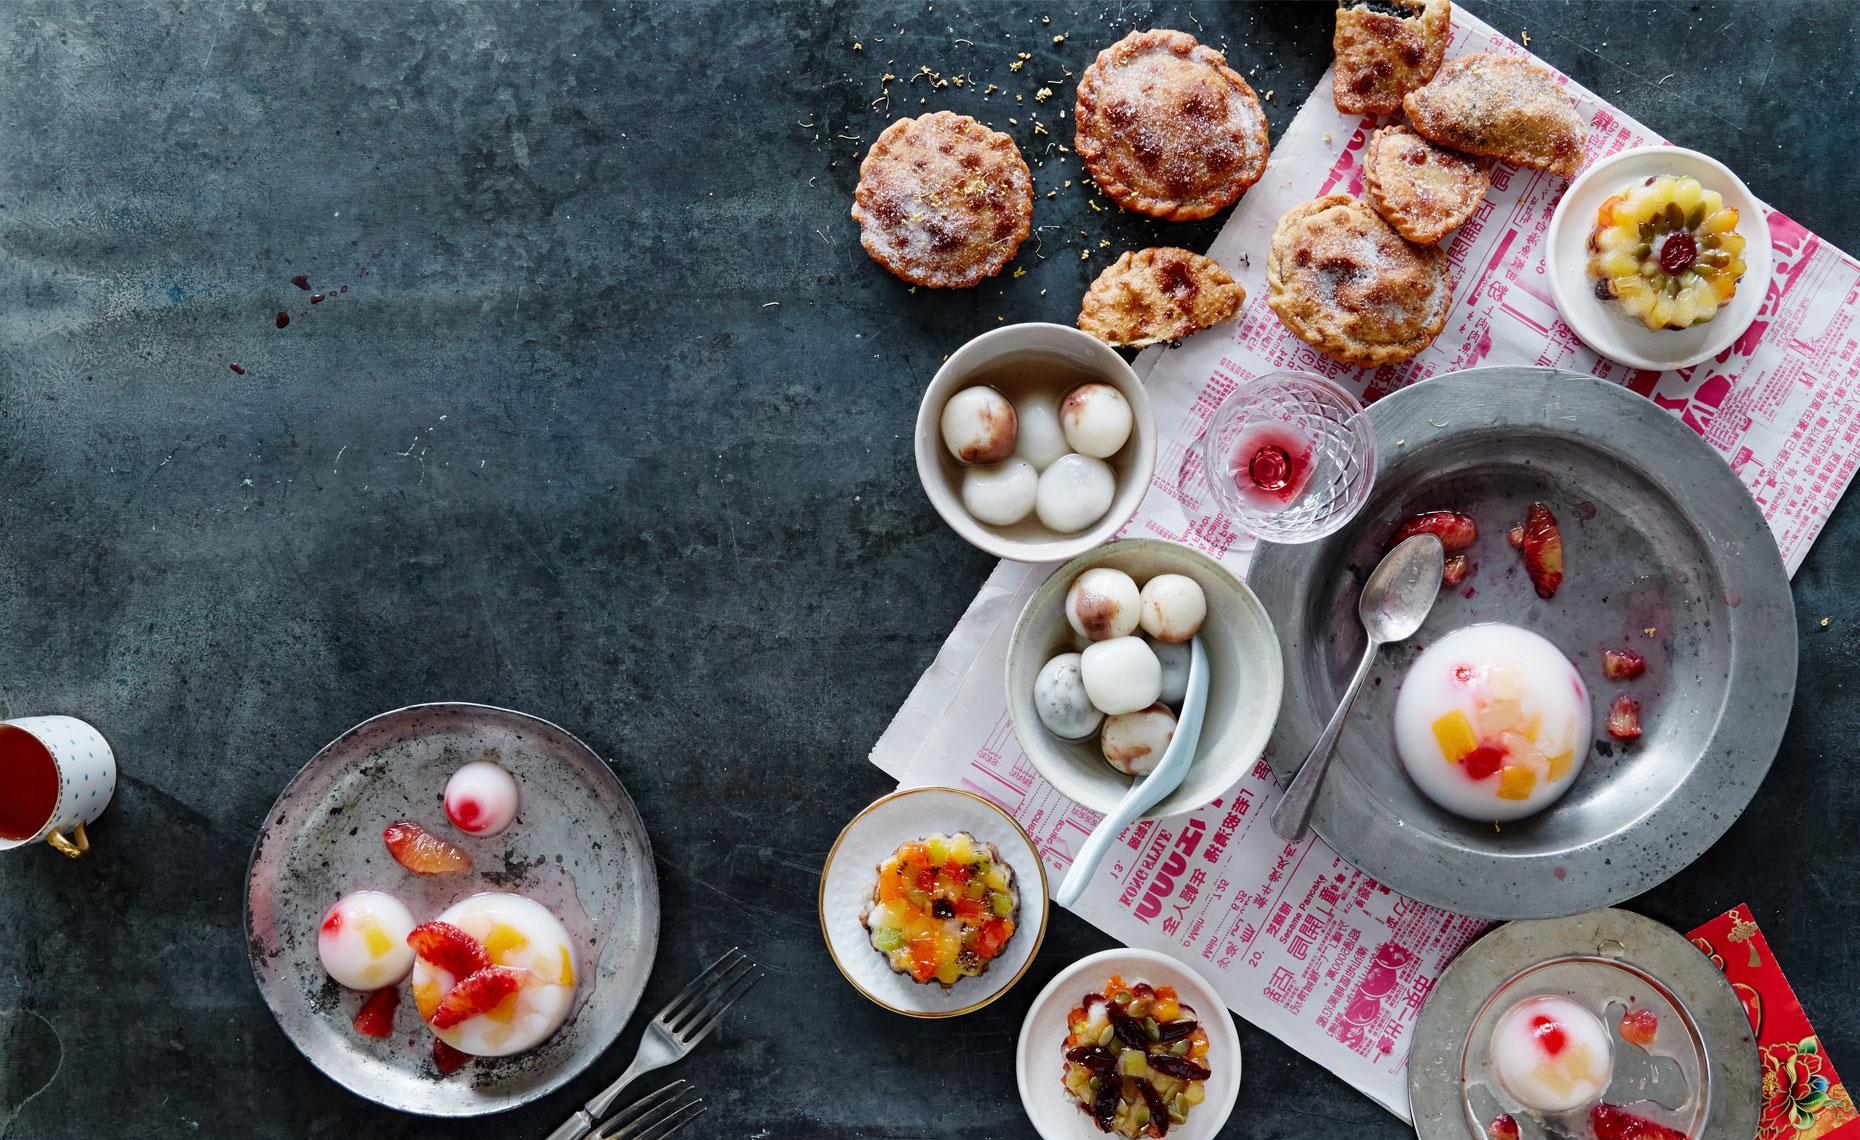 chinese-desserts-resized.jpg